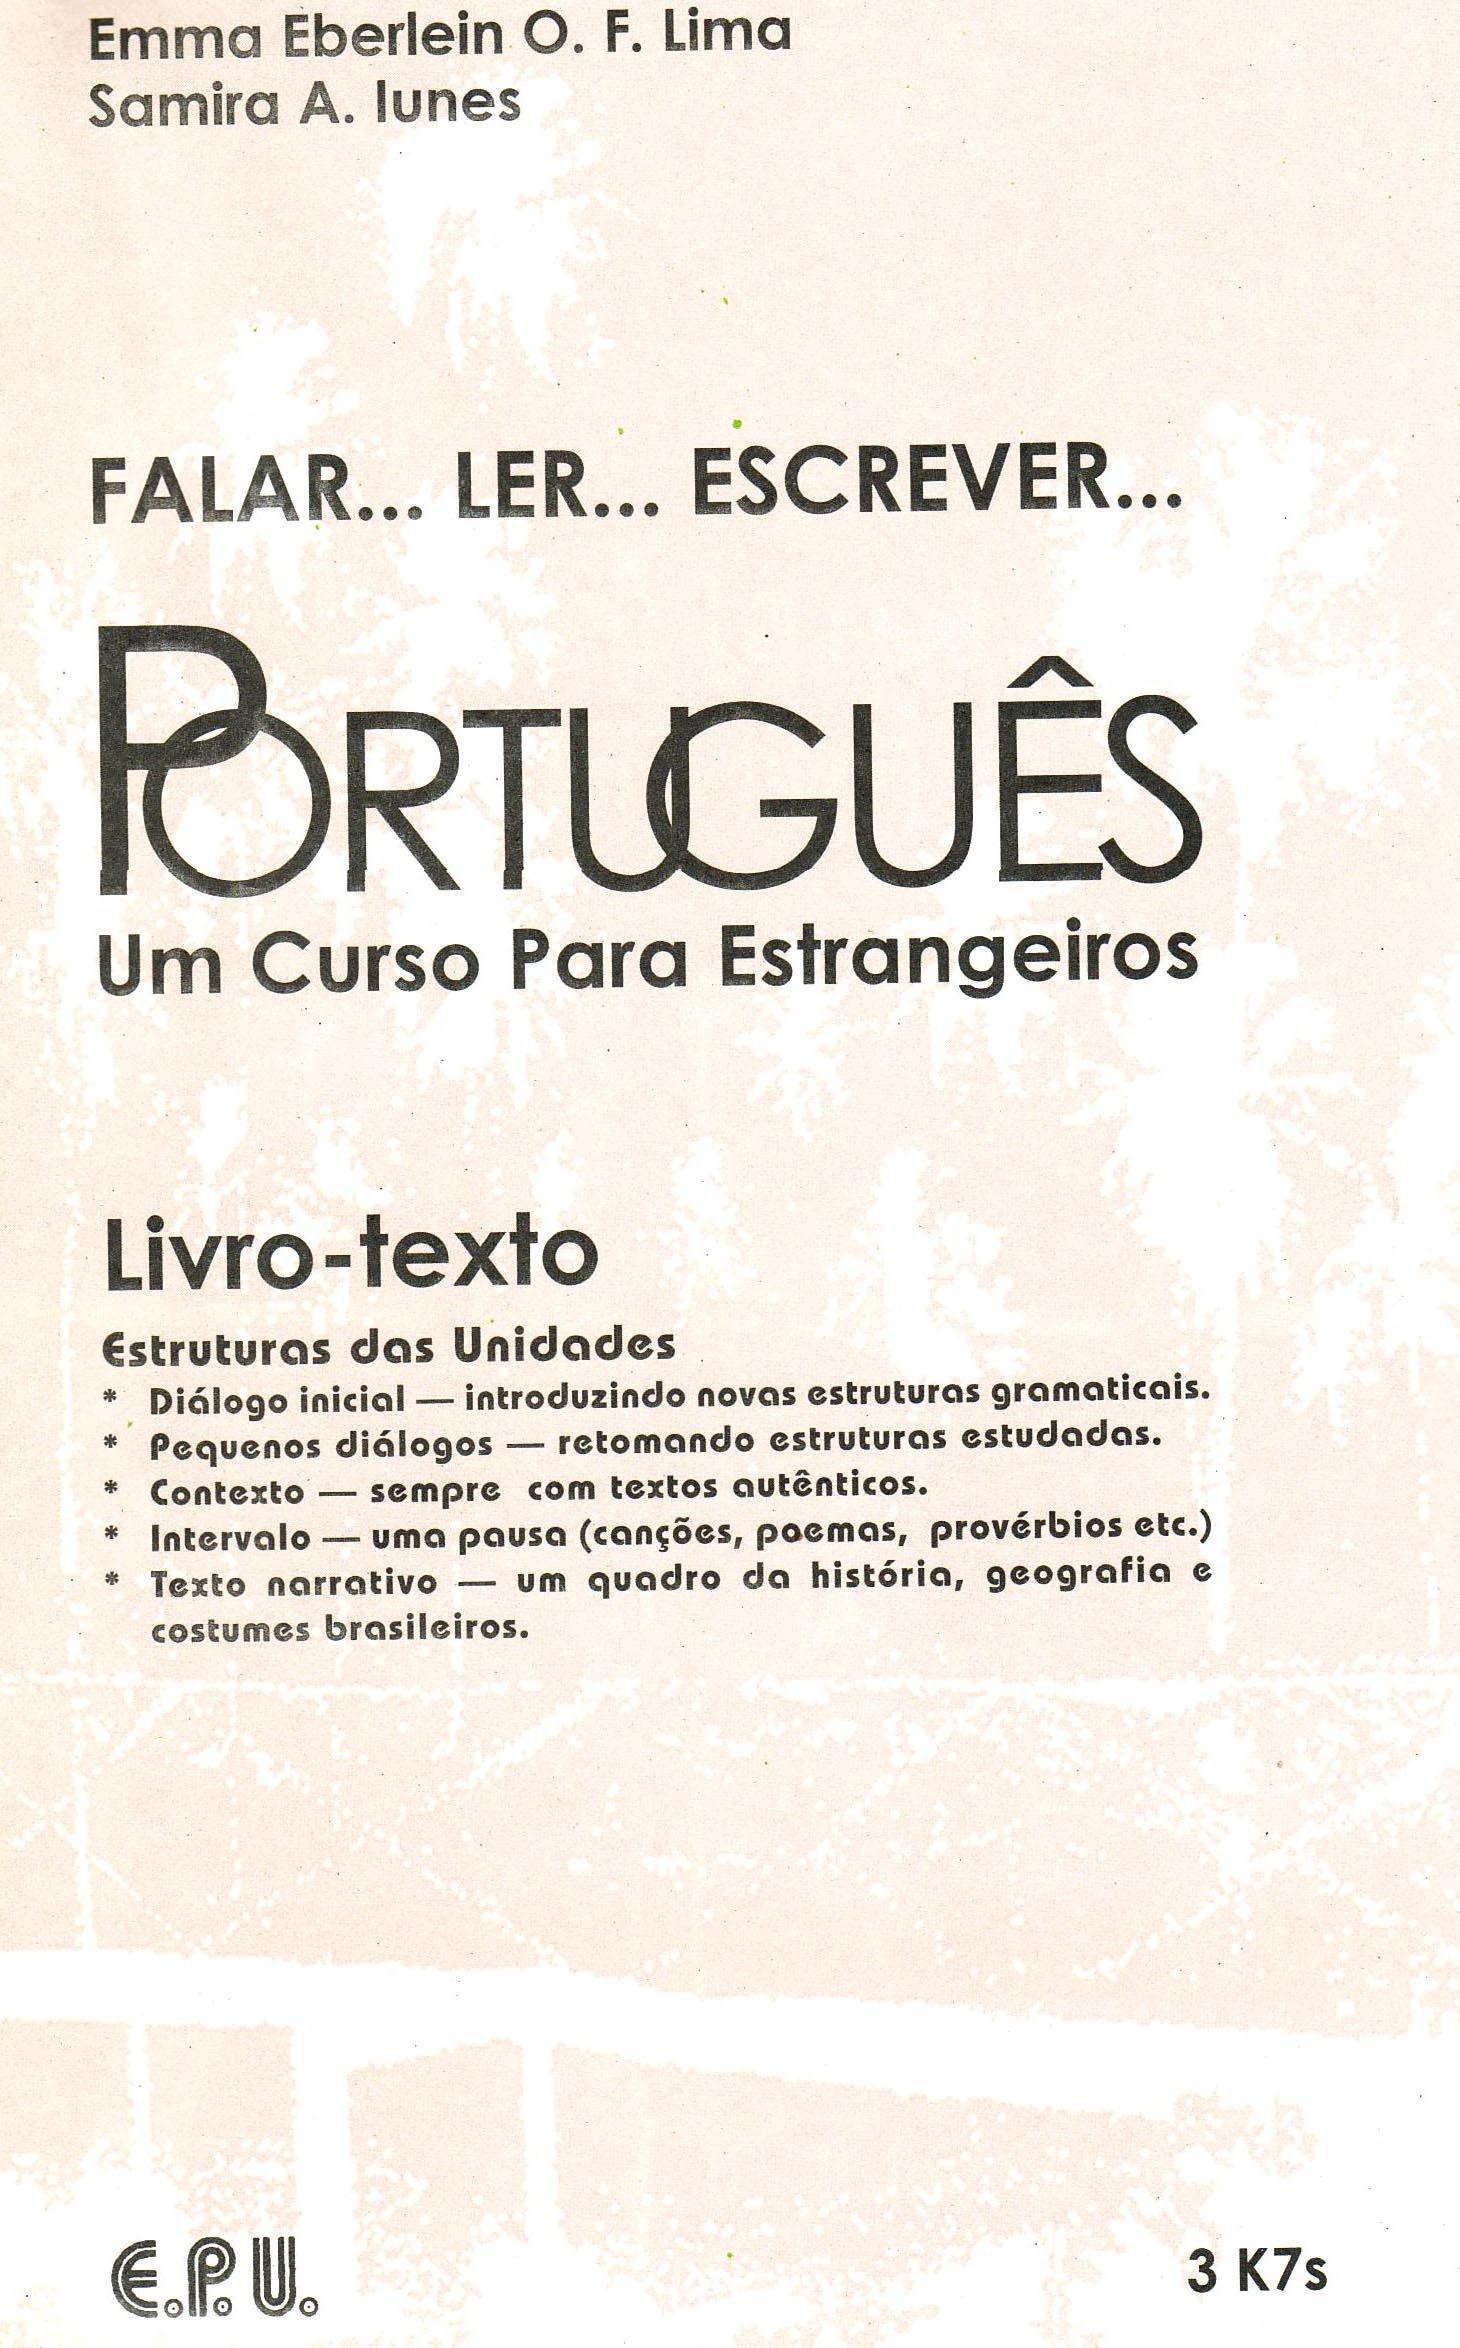 Falar. Ler. Escrever. Português. Brasilianisches Portugiesisch in einem Band. Lehrbuch: Brasilianisches Portugiesisch in einem Band/Cassette (Falar.Ler.Escrever.Portugues)